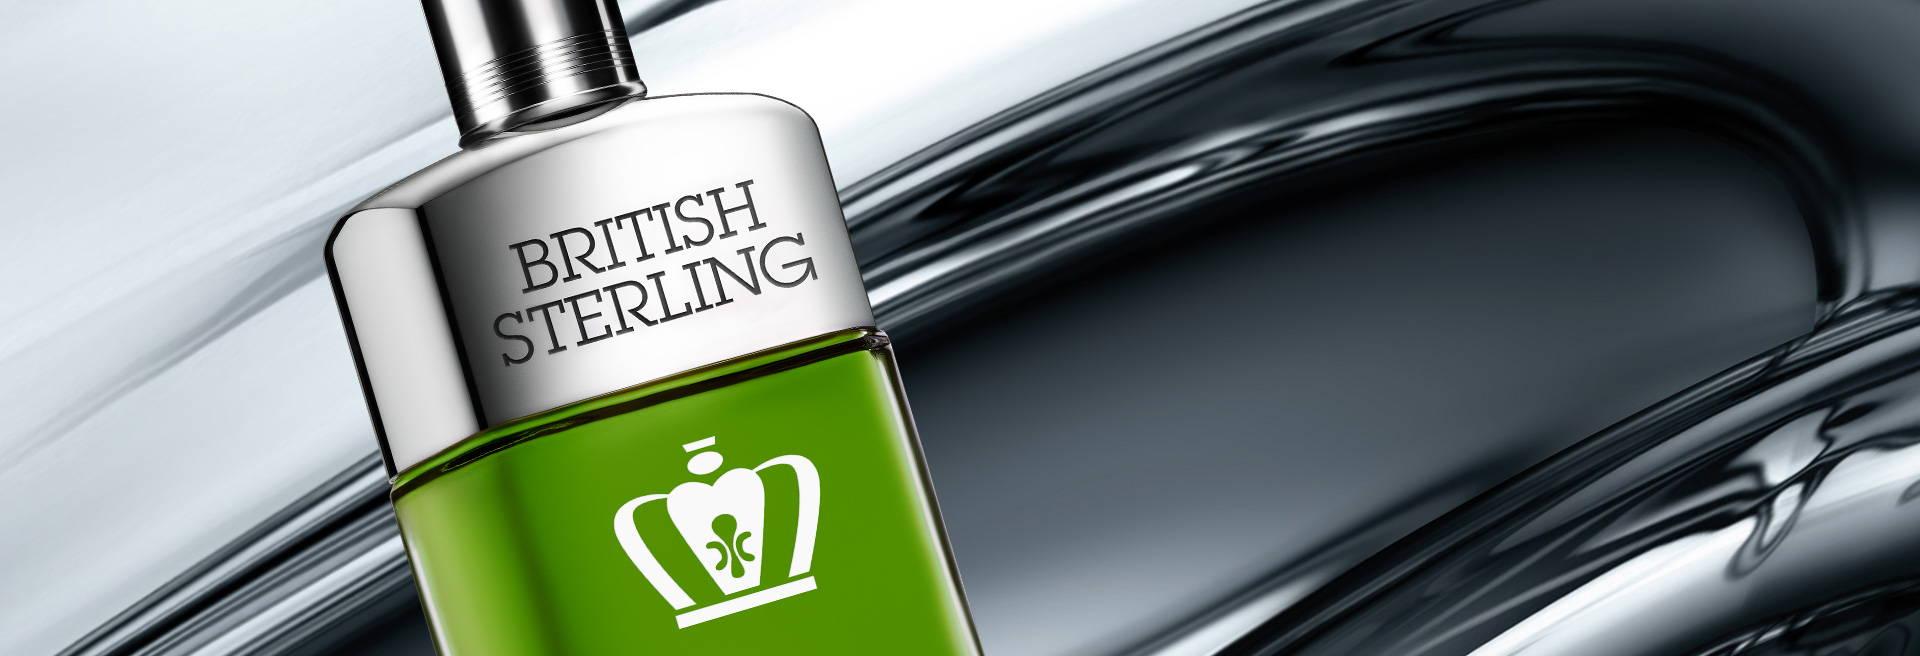 Bottle of British Sterling cologne, silver